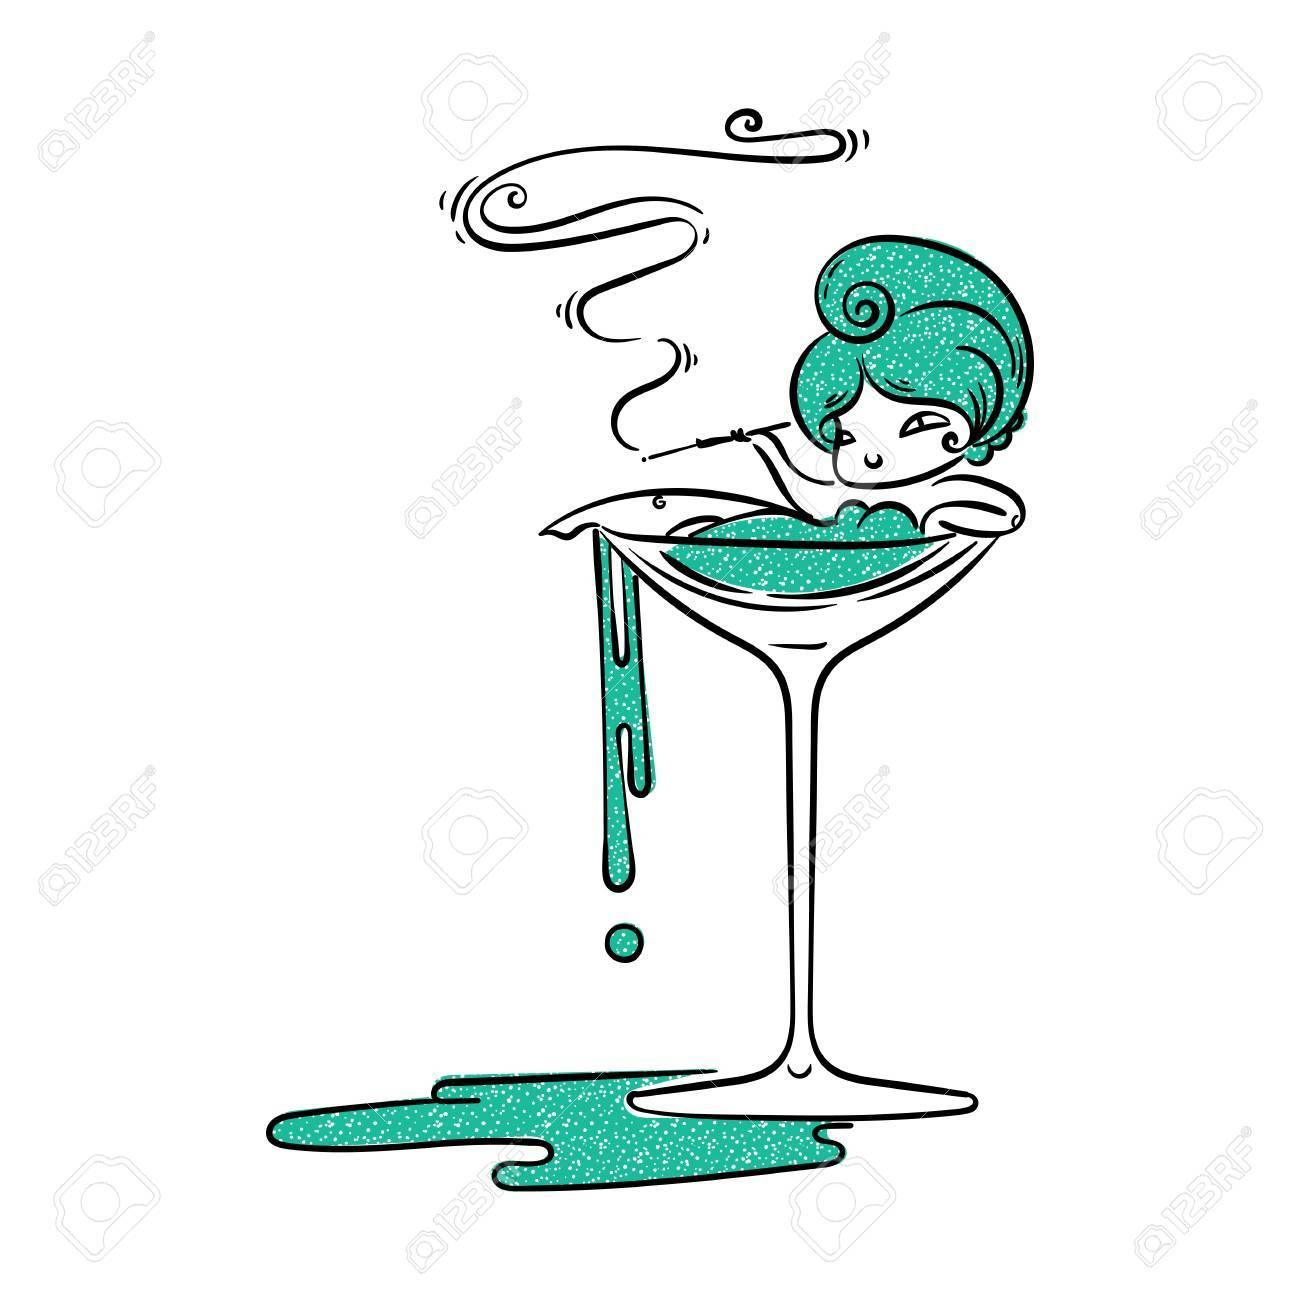 Cigarette Caricature fille belle caricature en verre martini avec cigarette. fumée de